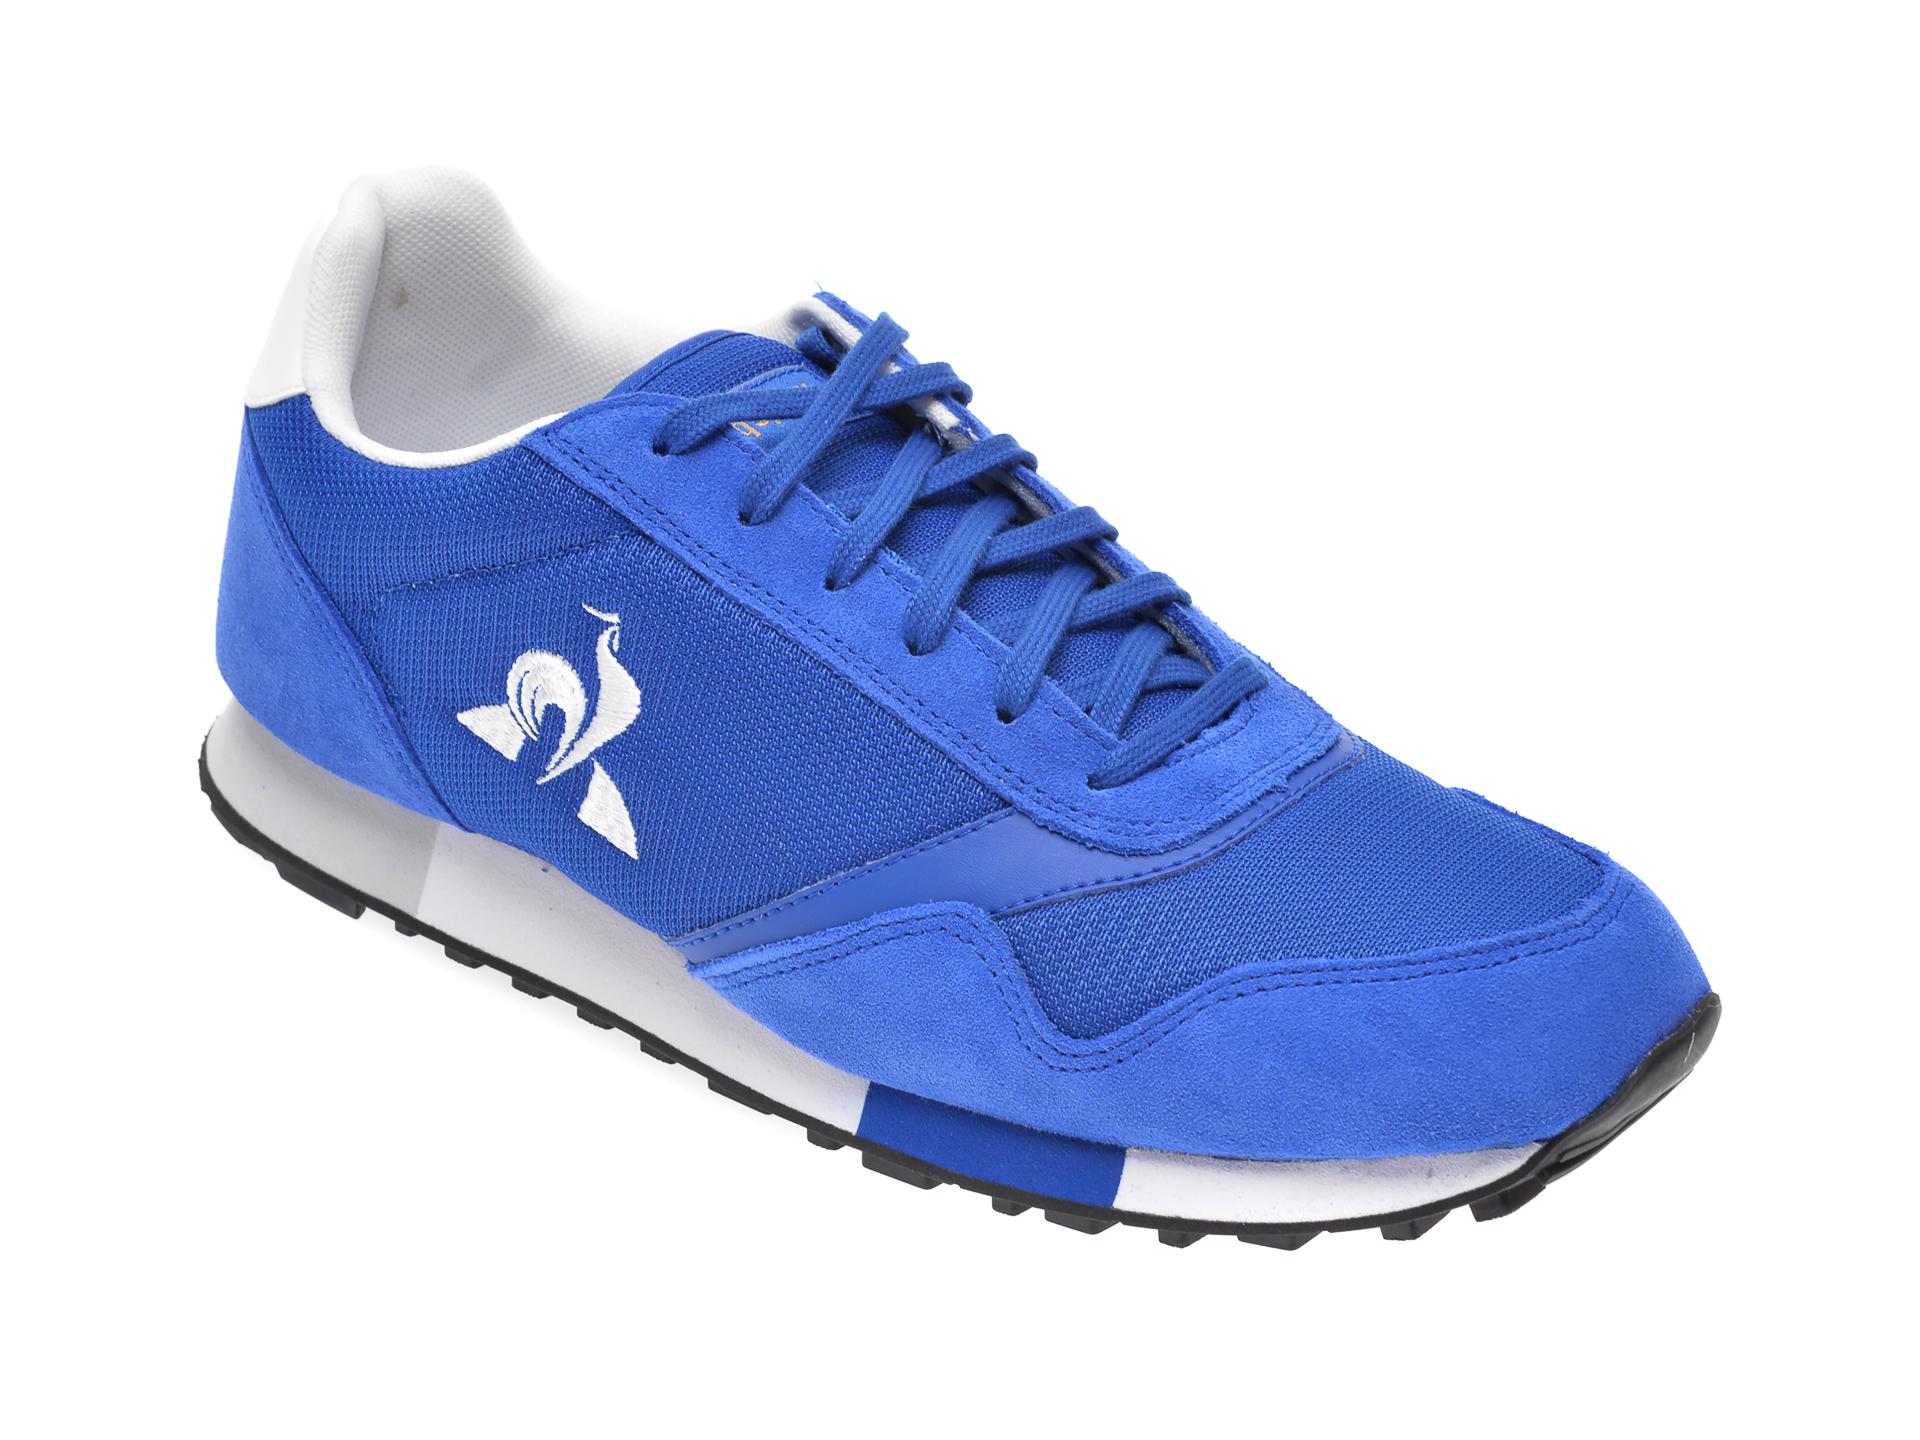 Pantofi Sport Le Coq Sportif Albastri, 2010312, Din Material Textil